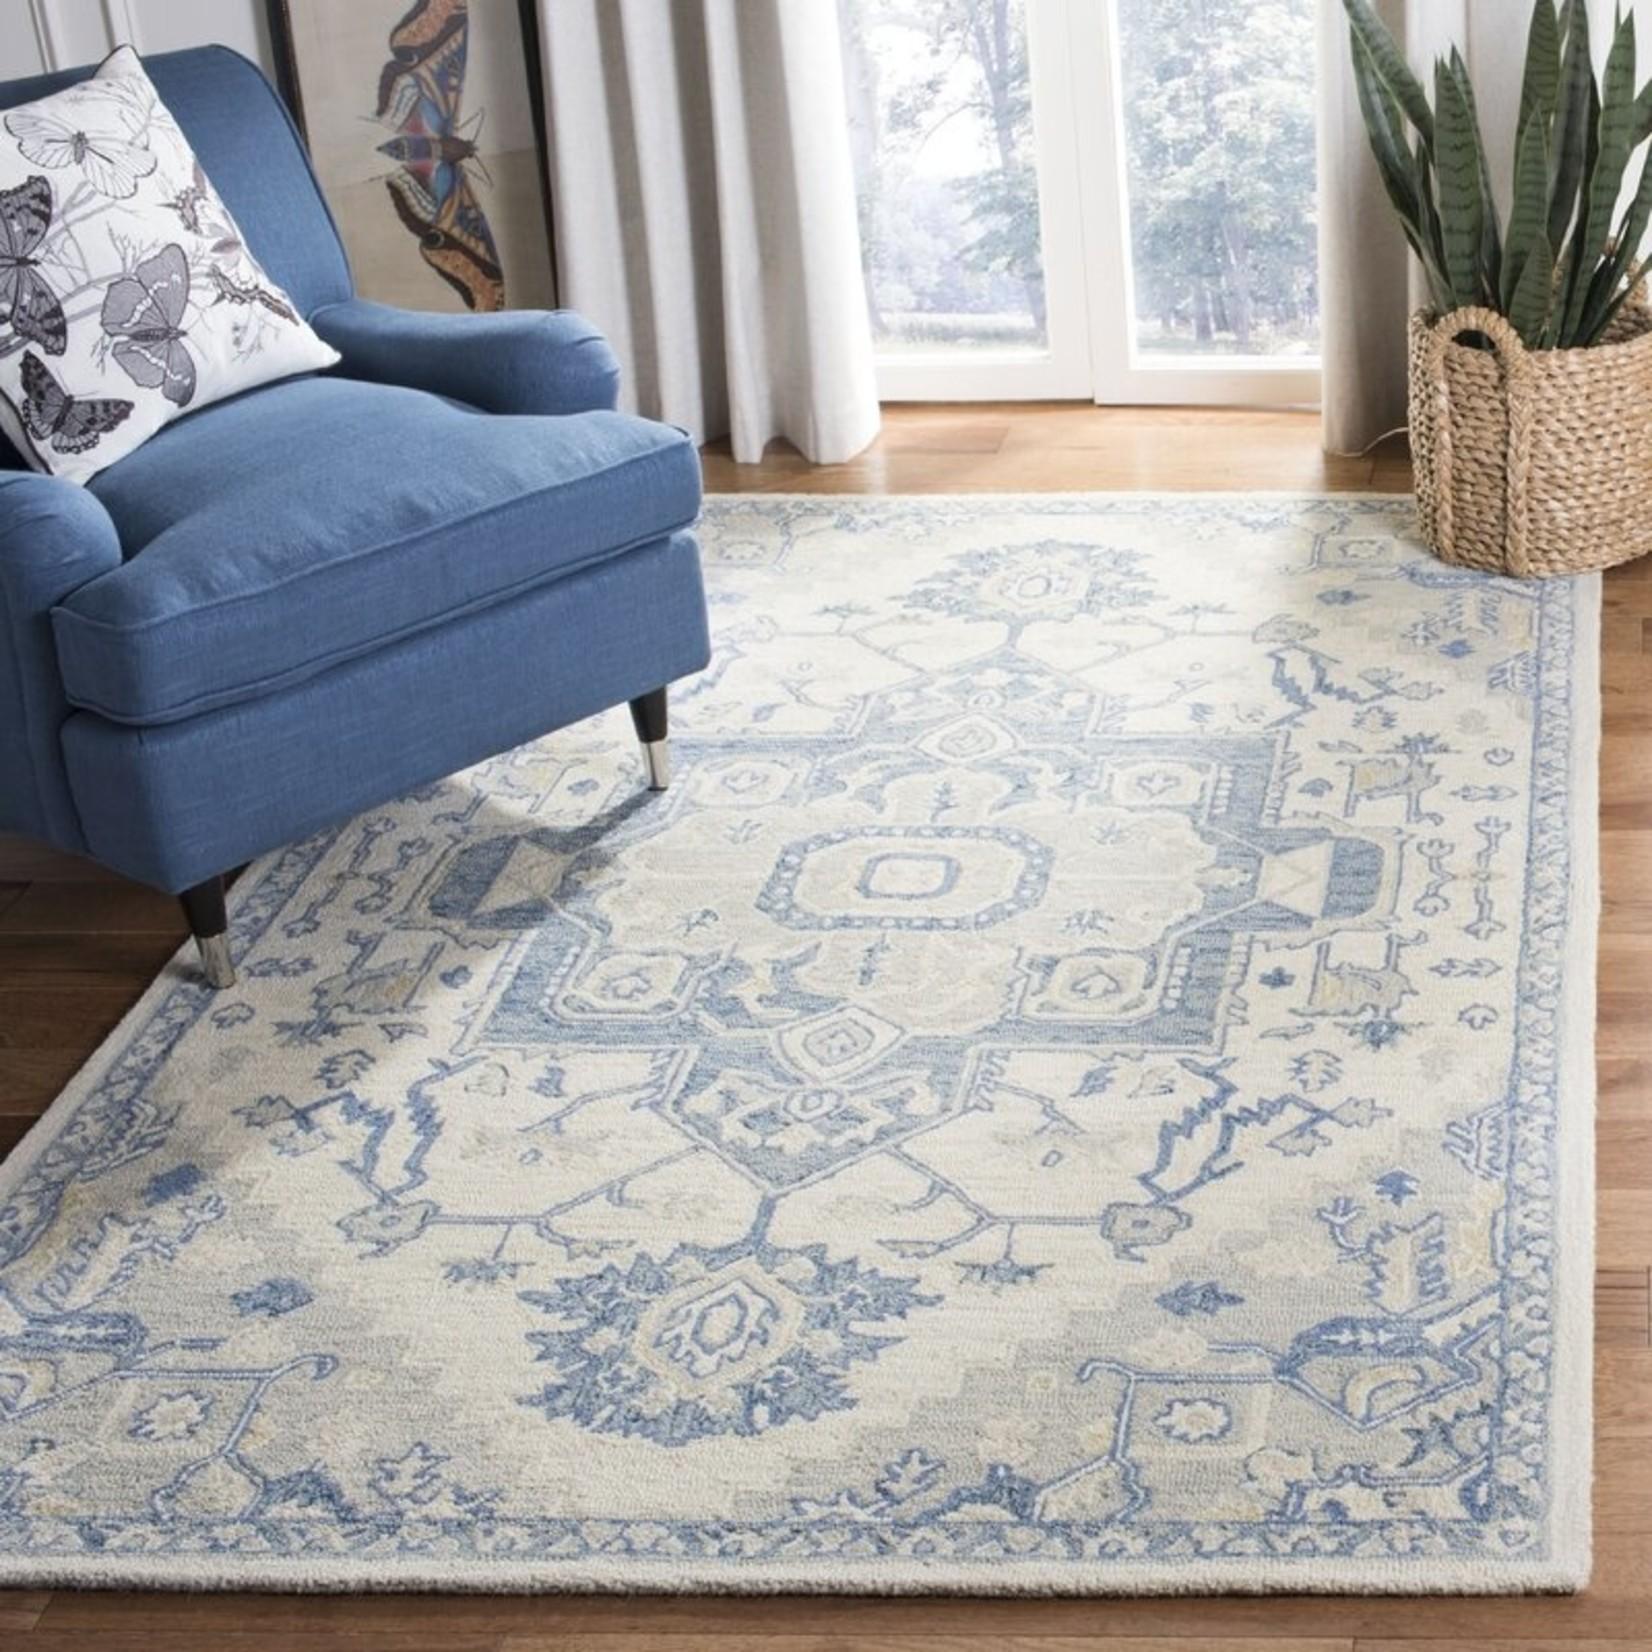 *5' x 8' - Cuvier Oriental Handwoven Wool Ivory/Blue Area Rug